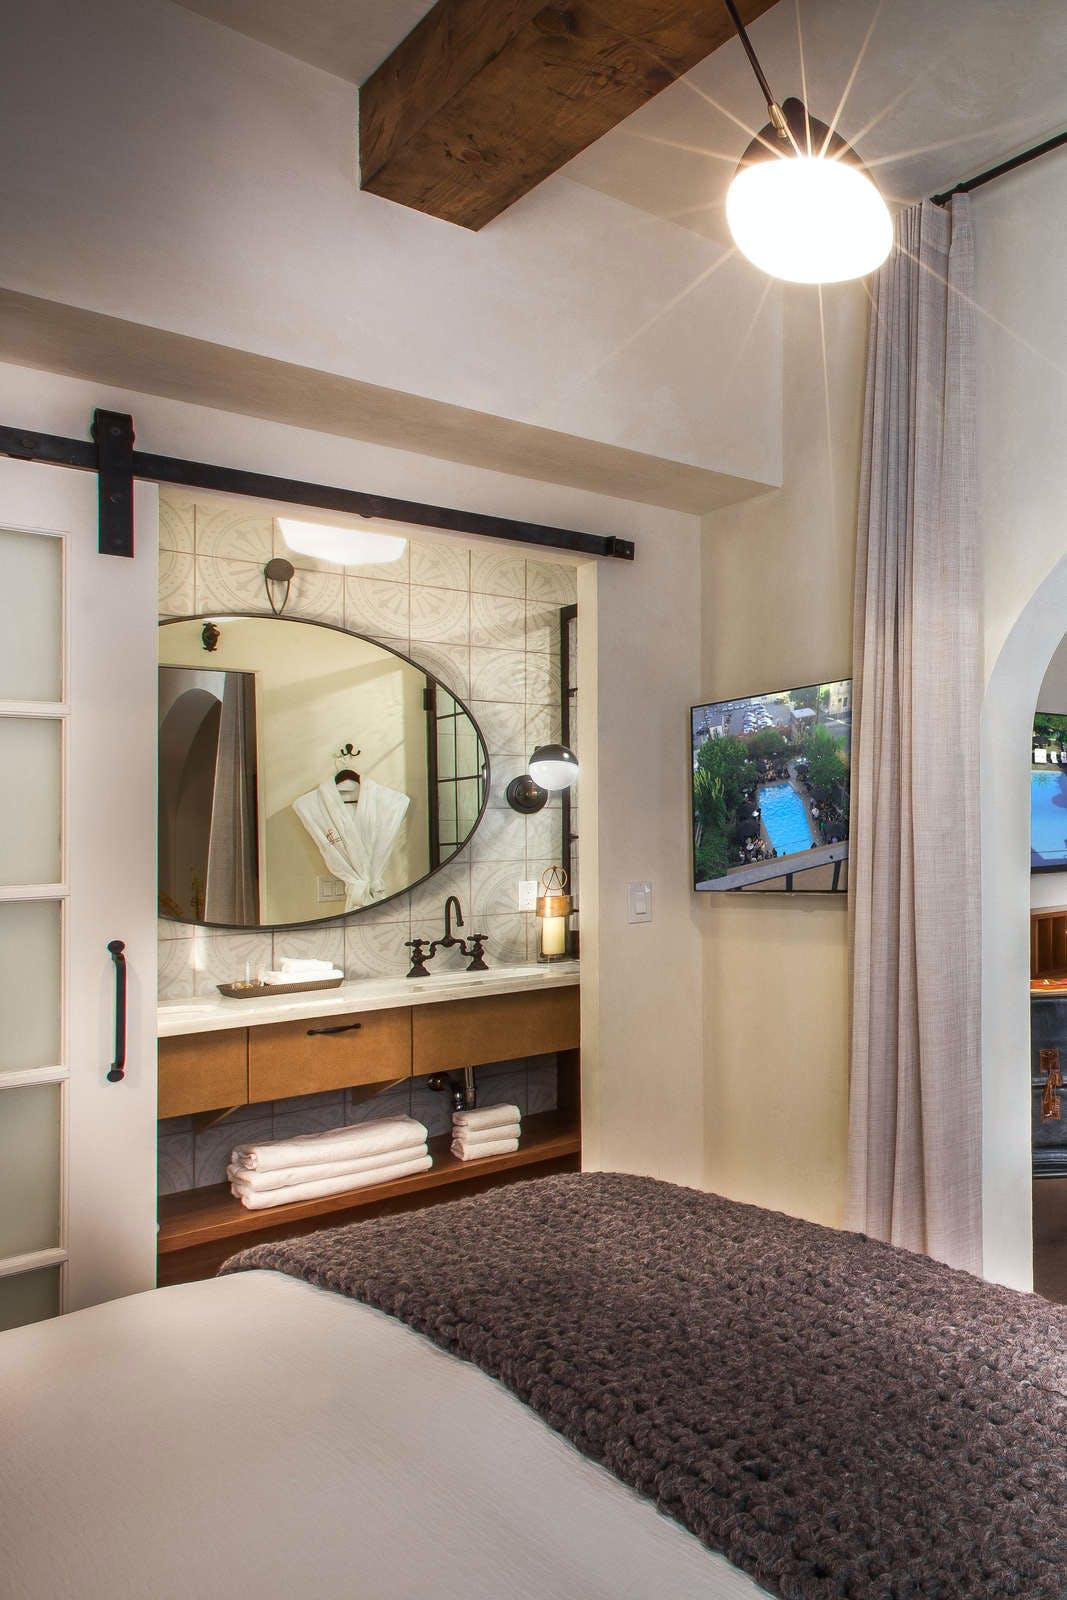 Hotel Figueroa Los Angeles